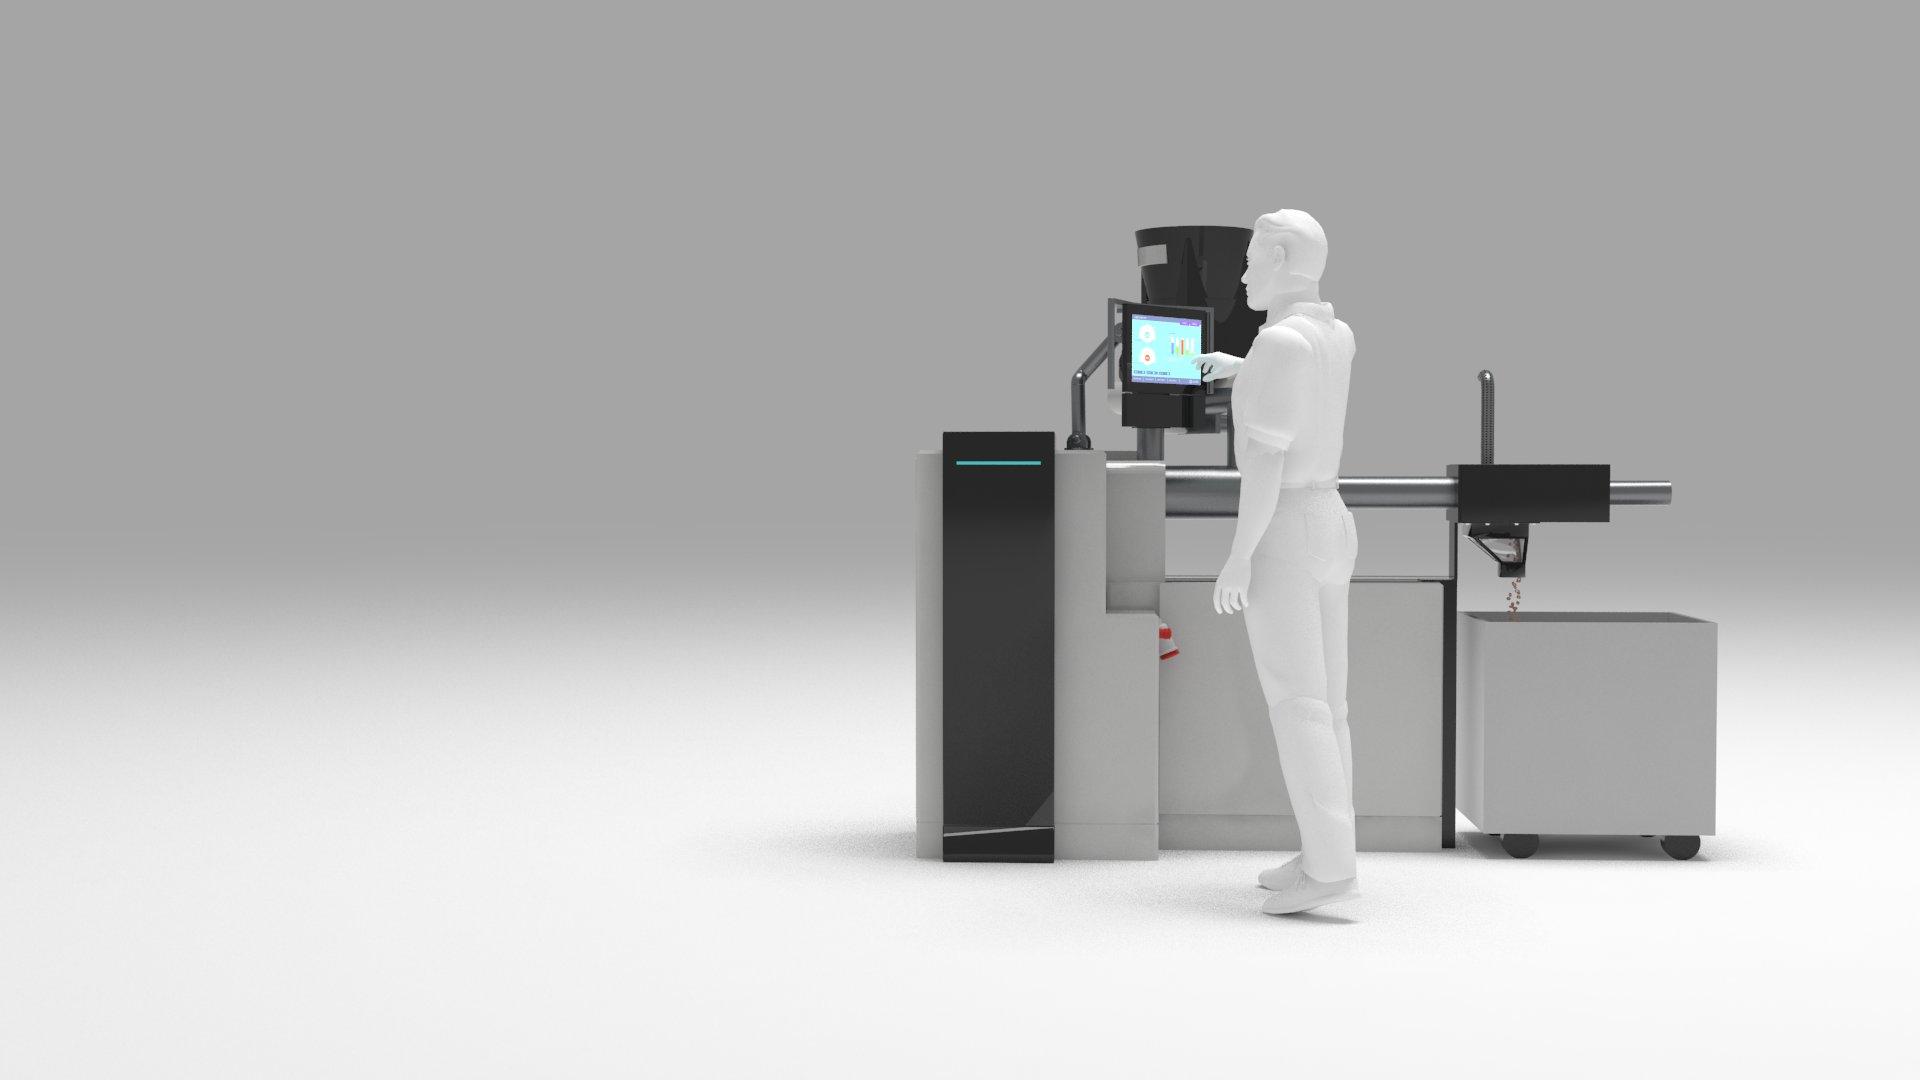 Maschinendesign bei simoleit-design.de